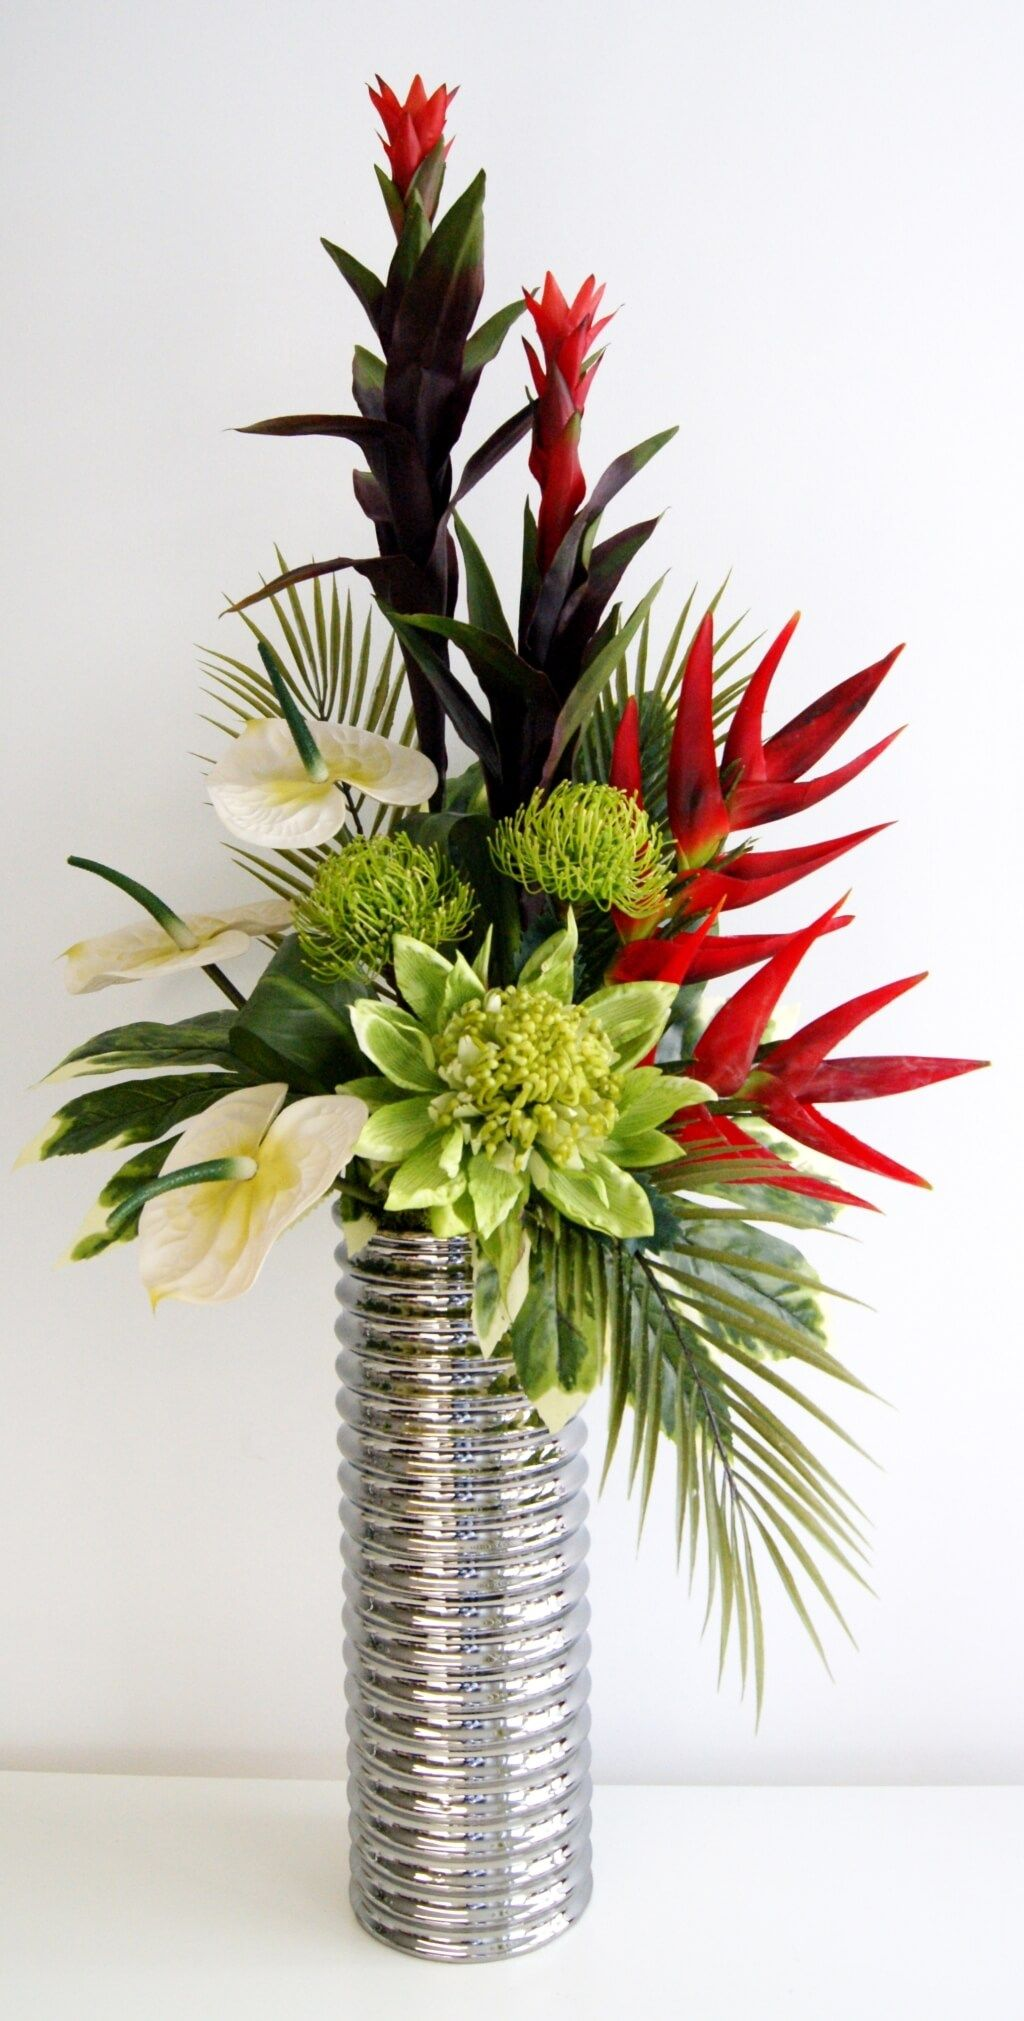 Home Decoration Fabulous Red Artificial Fl Arrangements With Spiral Vase Decorative